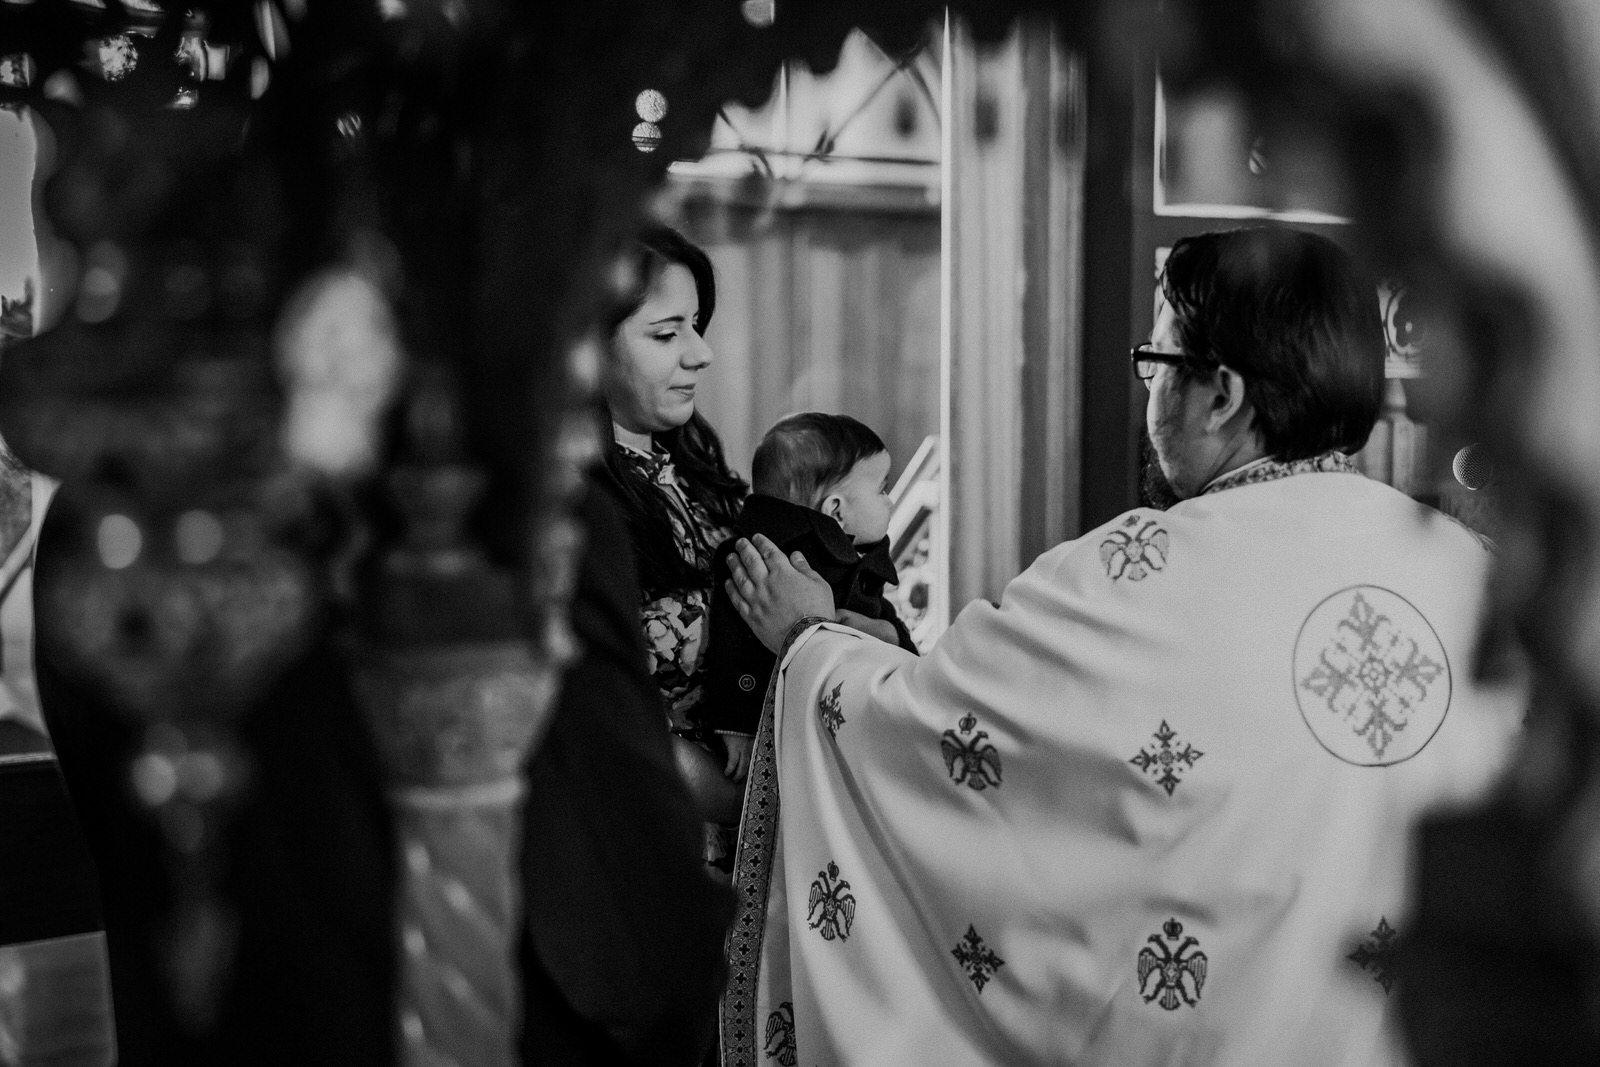 yianni-baptism-st-catherine-orthodox-mascot-laqua-43